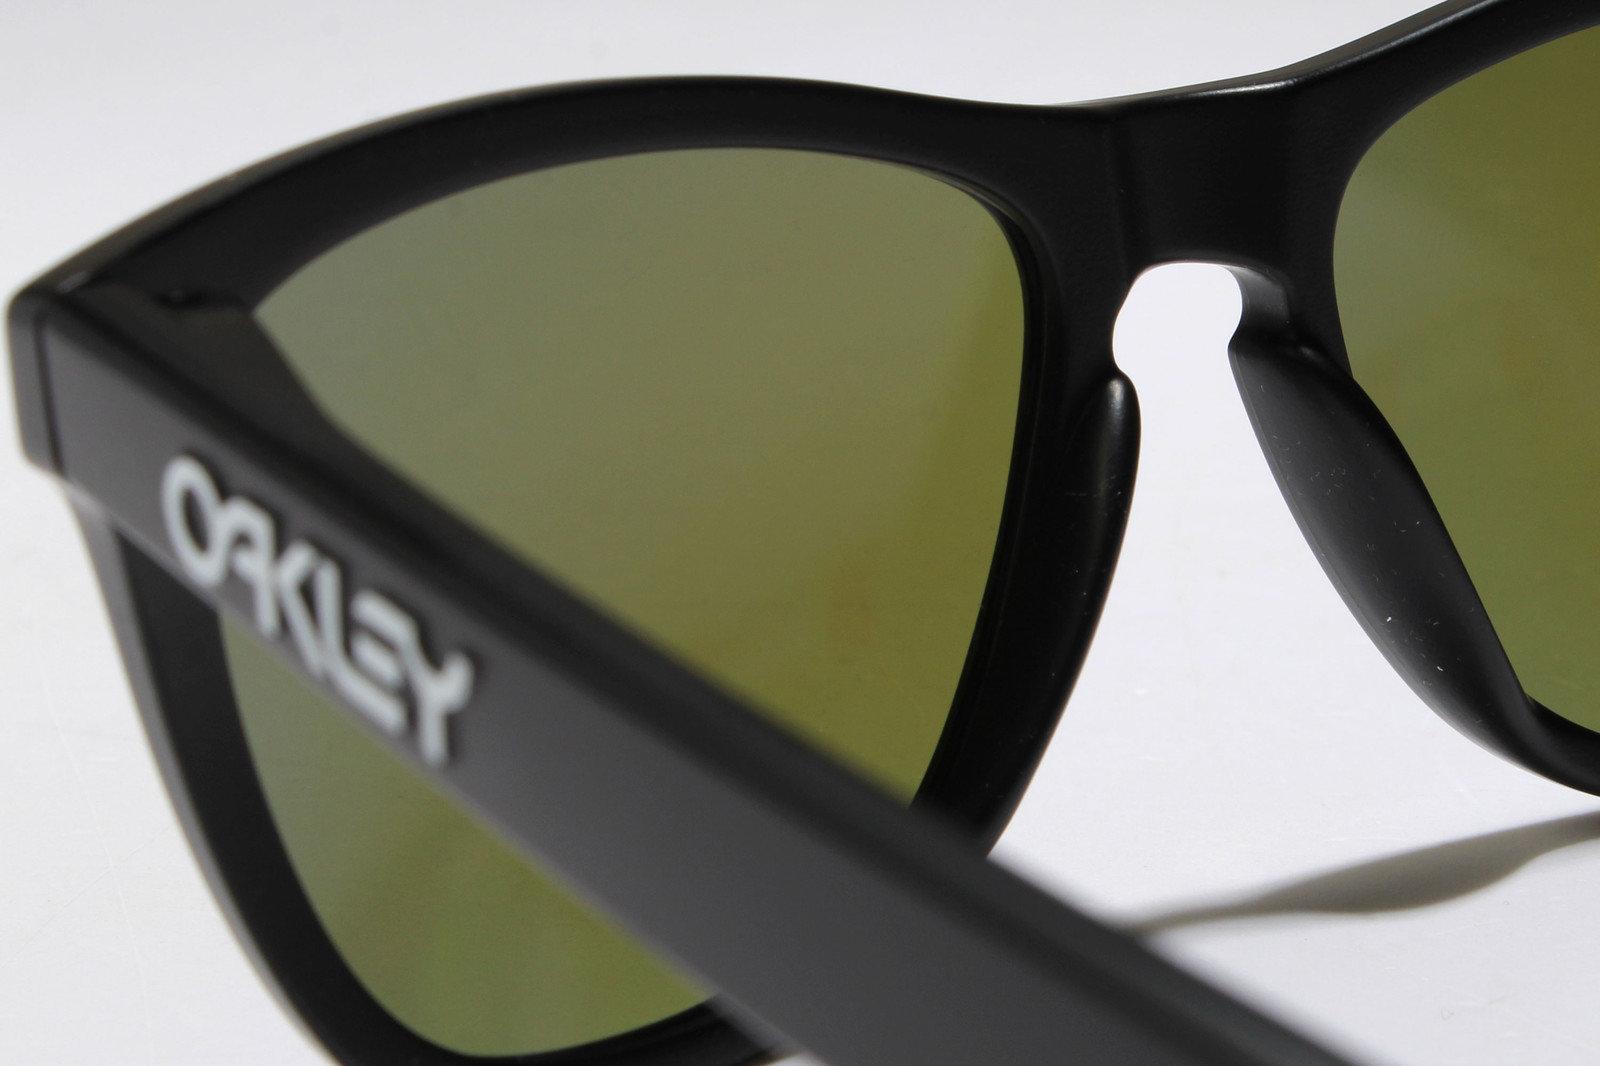 dc02efd3e0 Oakley Mens Frogskins OO9013 24-29855 Sunglasses Accessory Sports Training